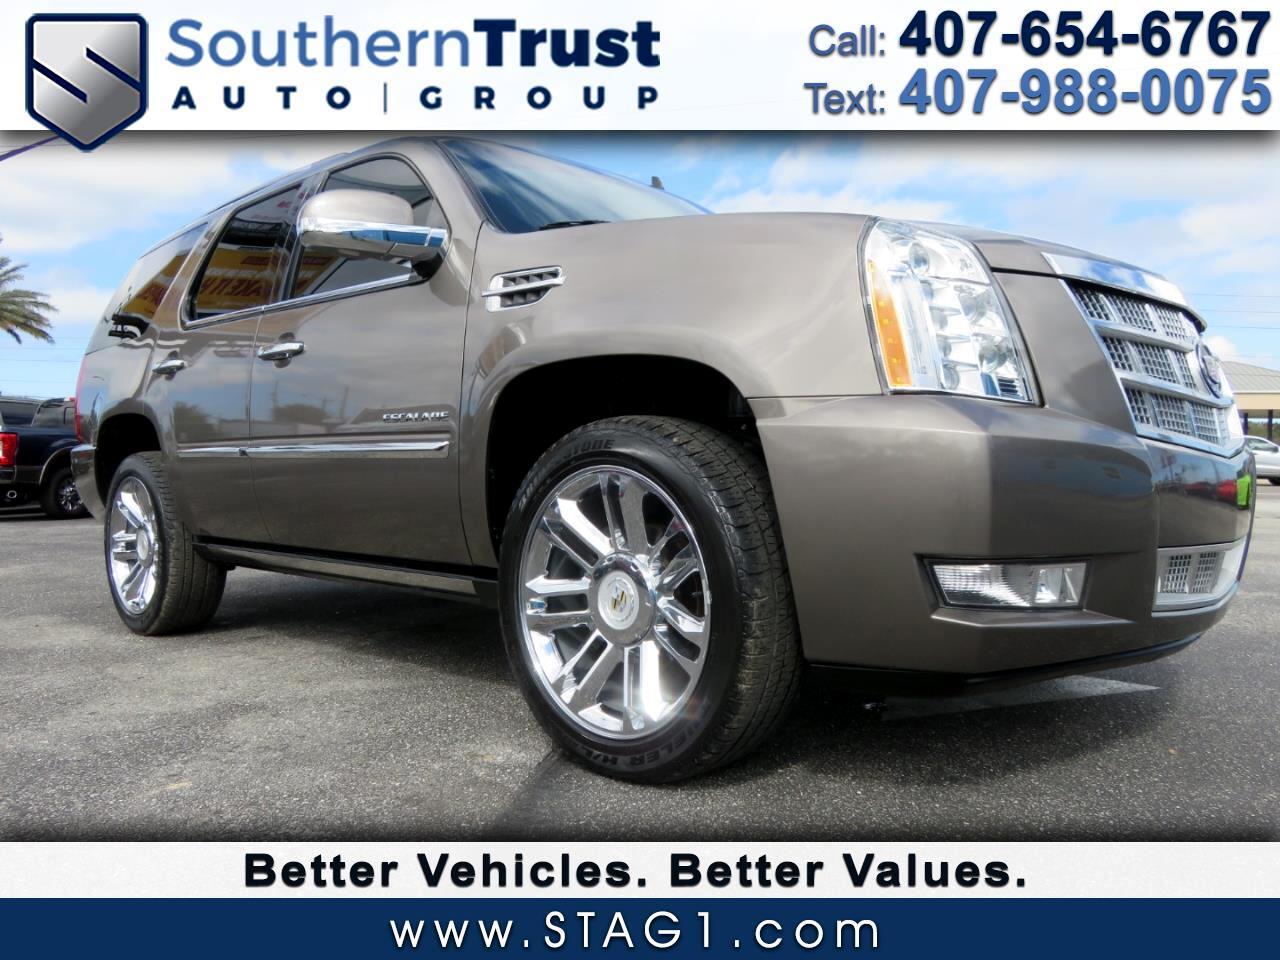 Cadillac Escalade 2WD 4dr Platinum Edition 2011